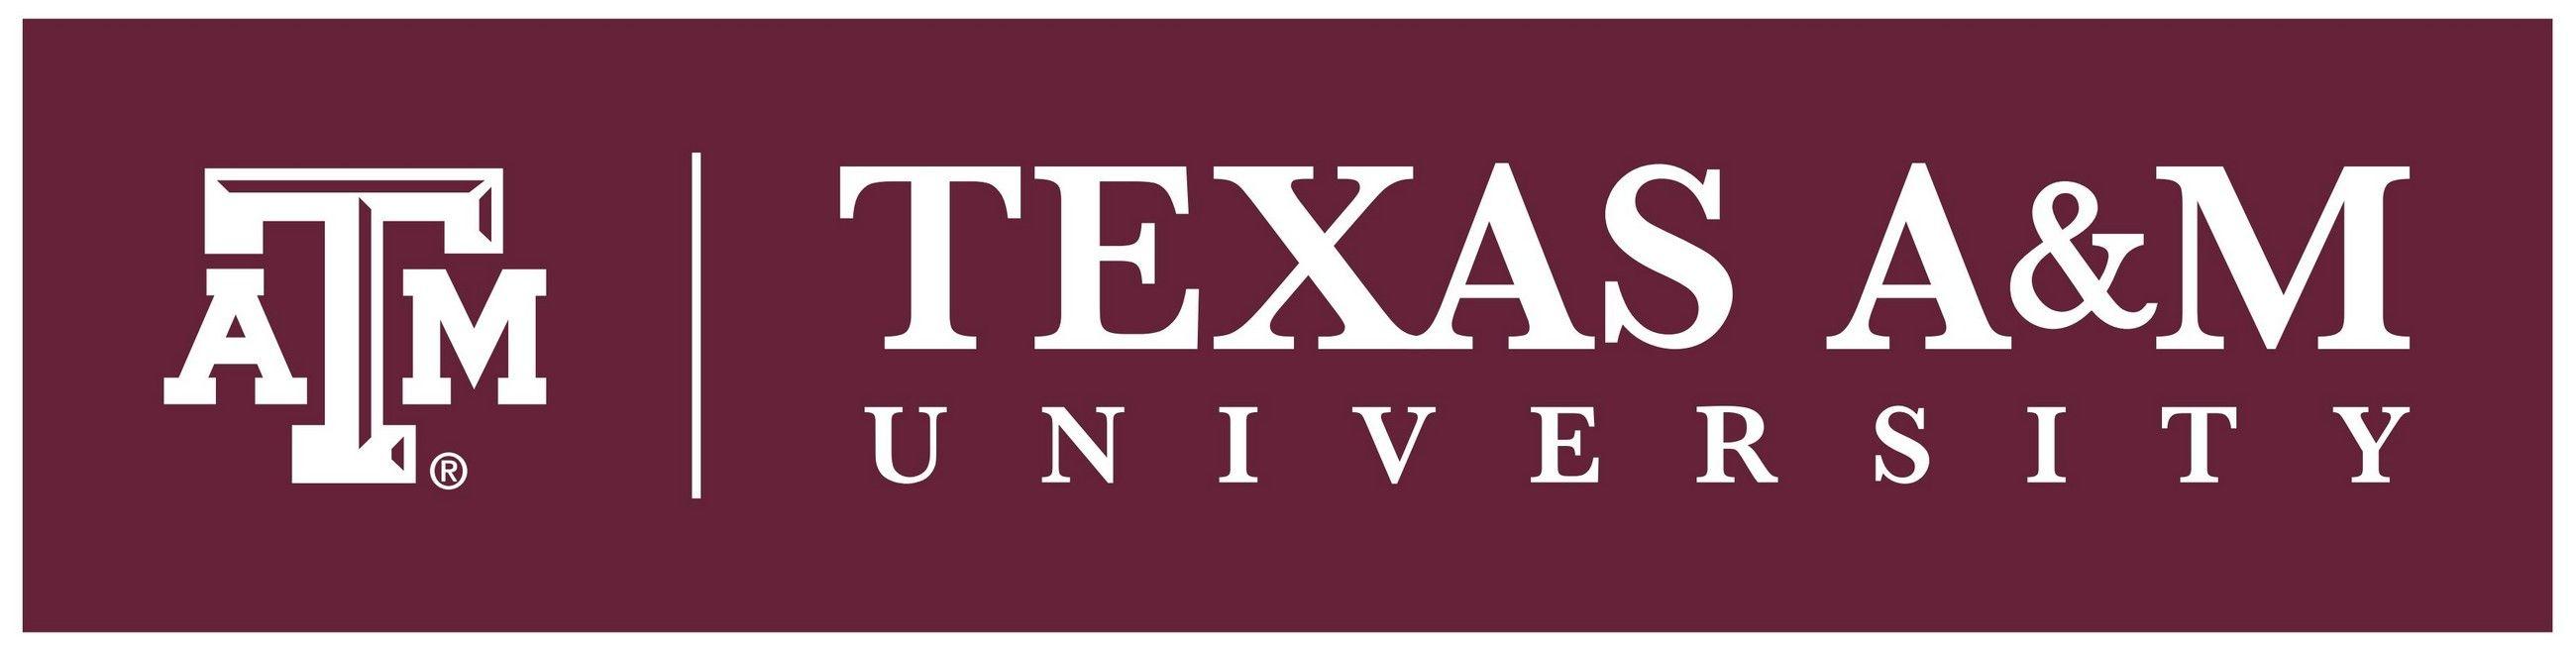 Tamu Texa A M University Arm Emblem Ep Pdf Vector Free Download Logo Icon Brand Essay Prompt Am Prompts